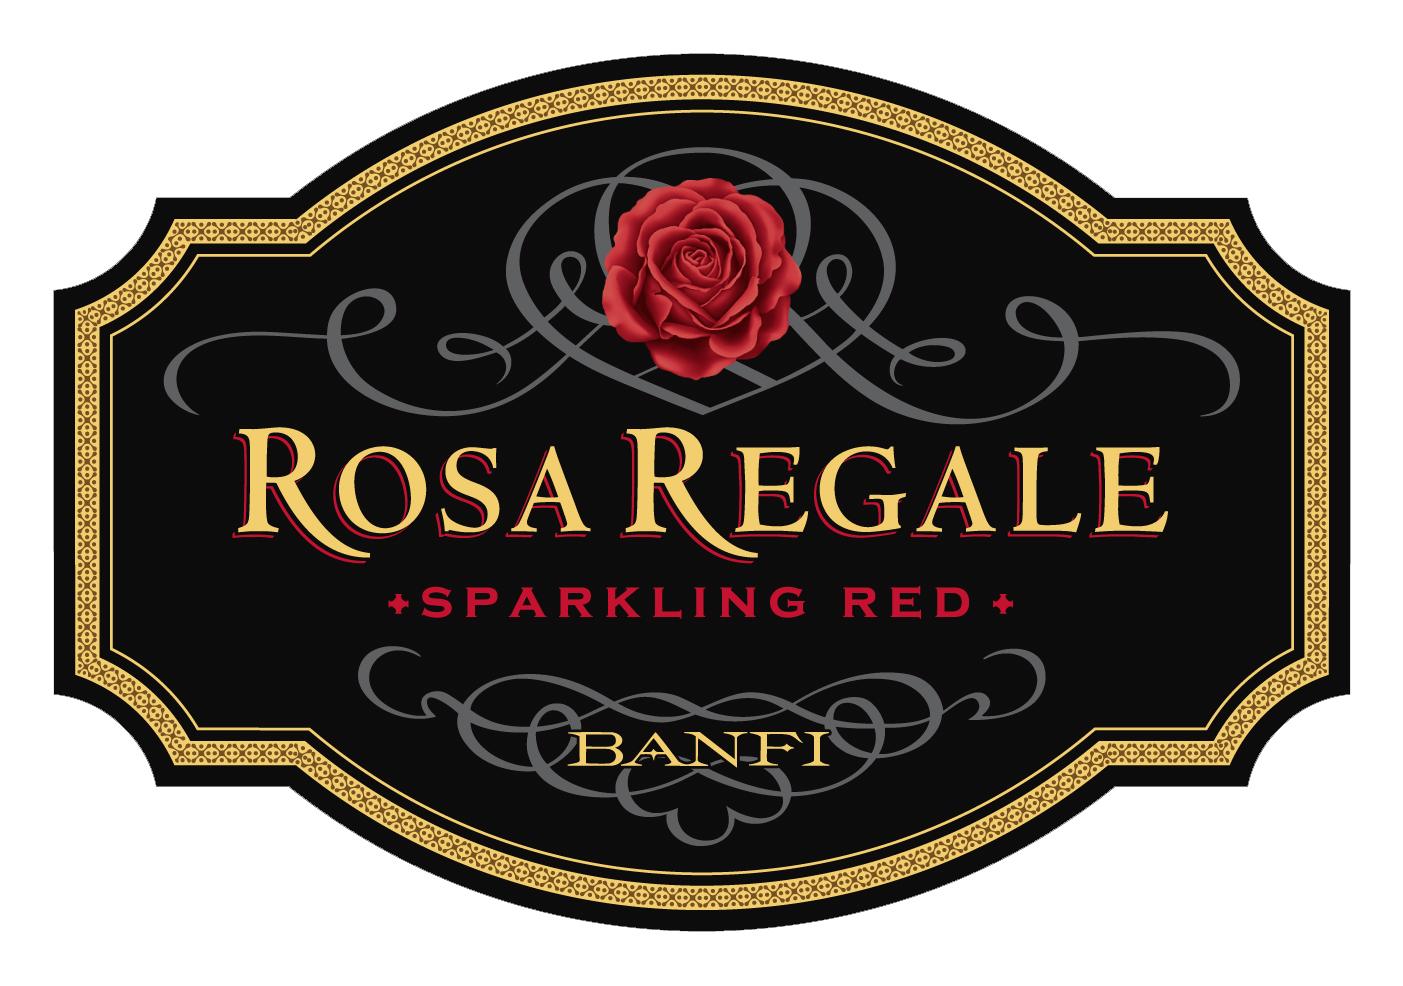 Vigne Regali Rosa Regale Brachetto d'Acqui Sparkling Red